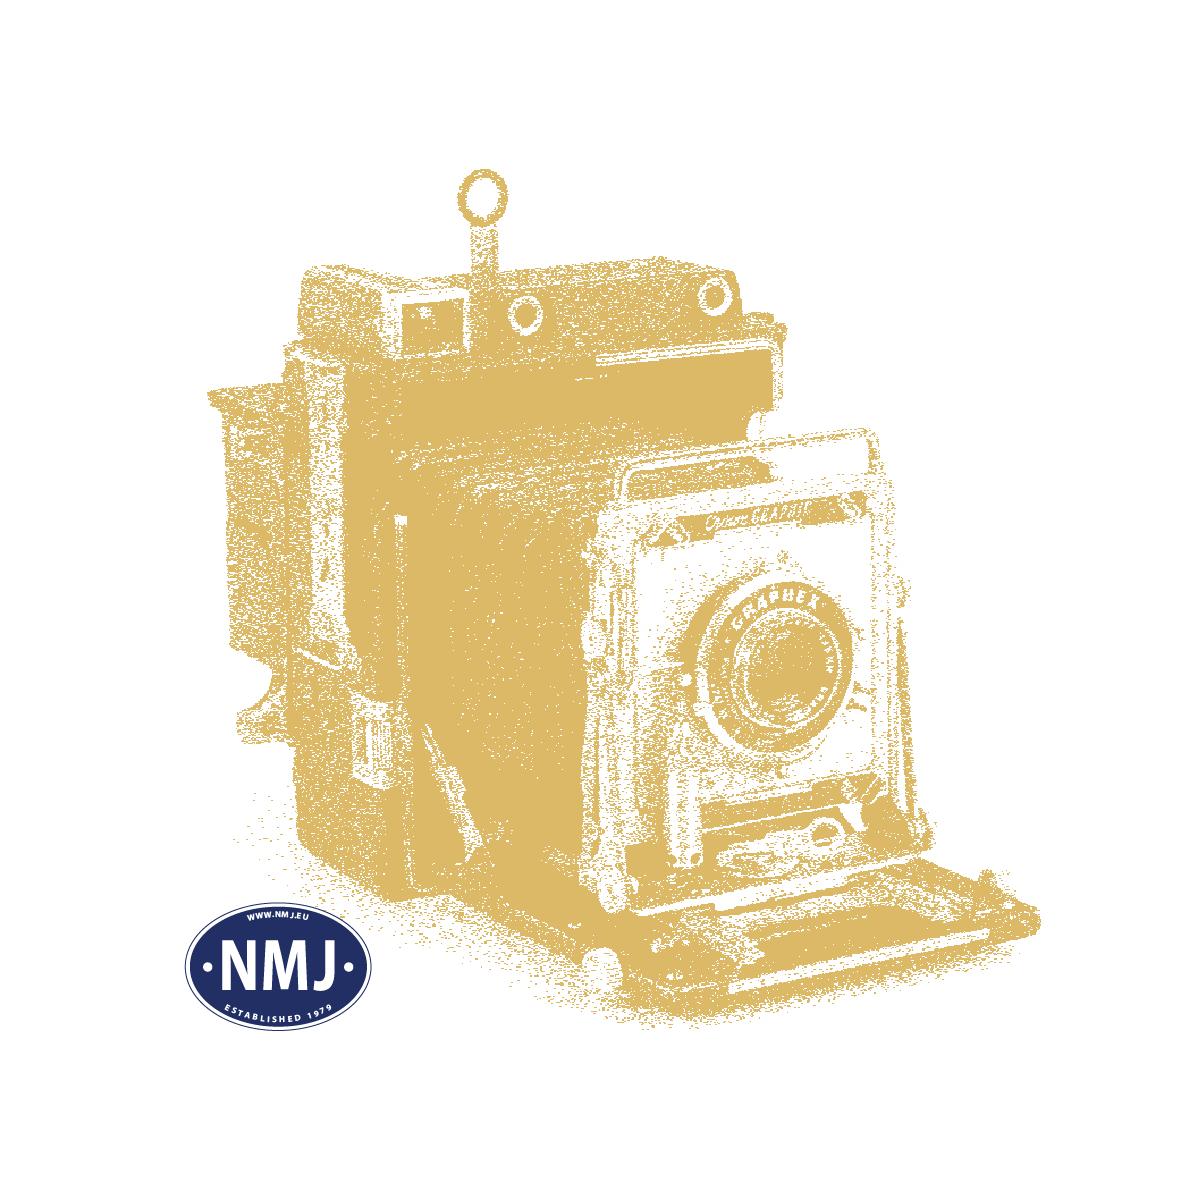 MWB-P602 - Gresstuster, Sommer, 6 mm, 21 x 15 Cm